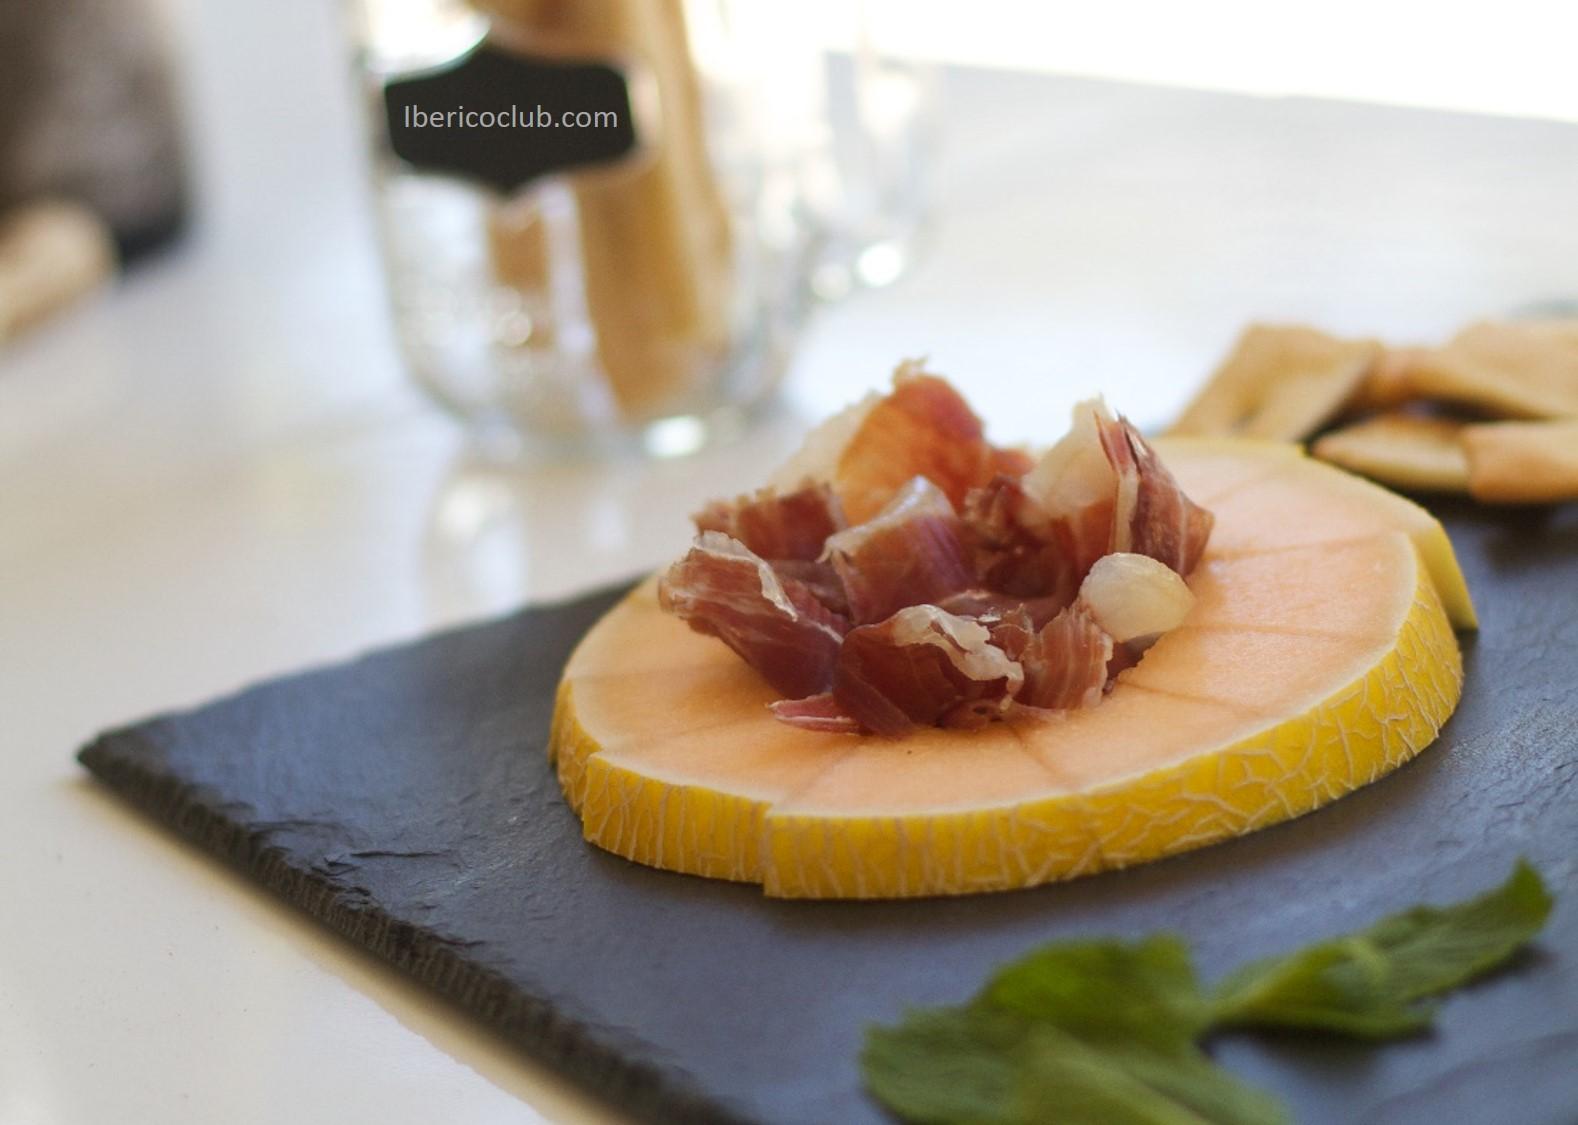 Melon with Jamon Iberico de bellota